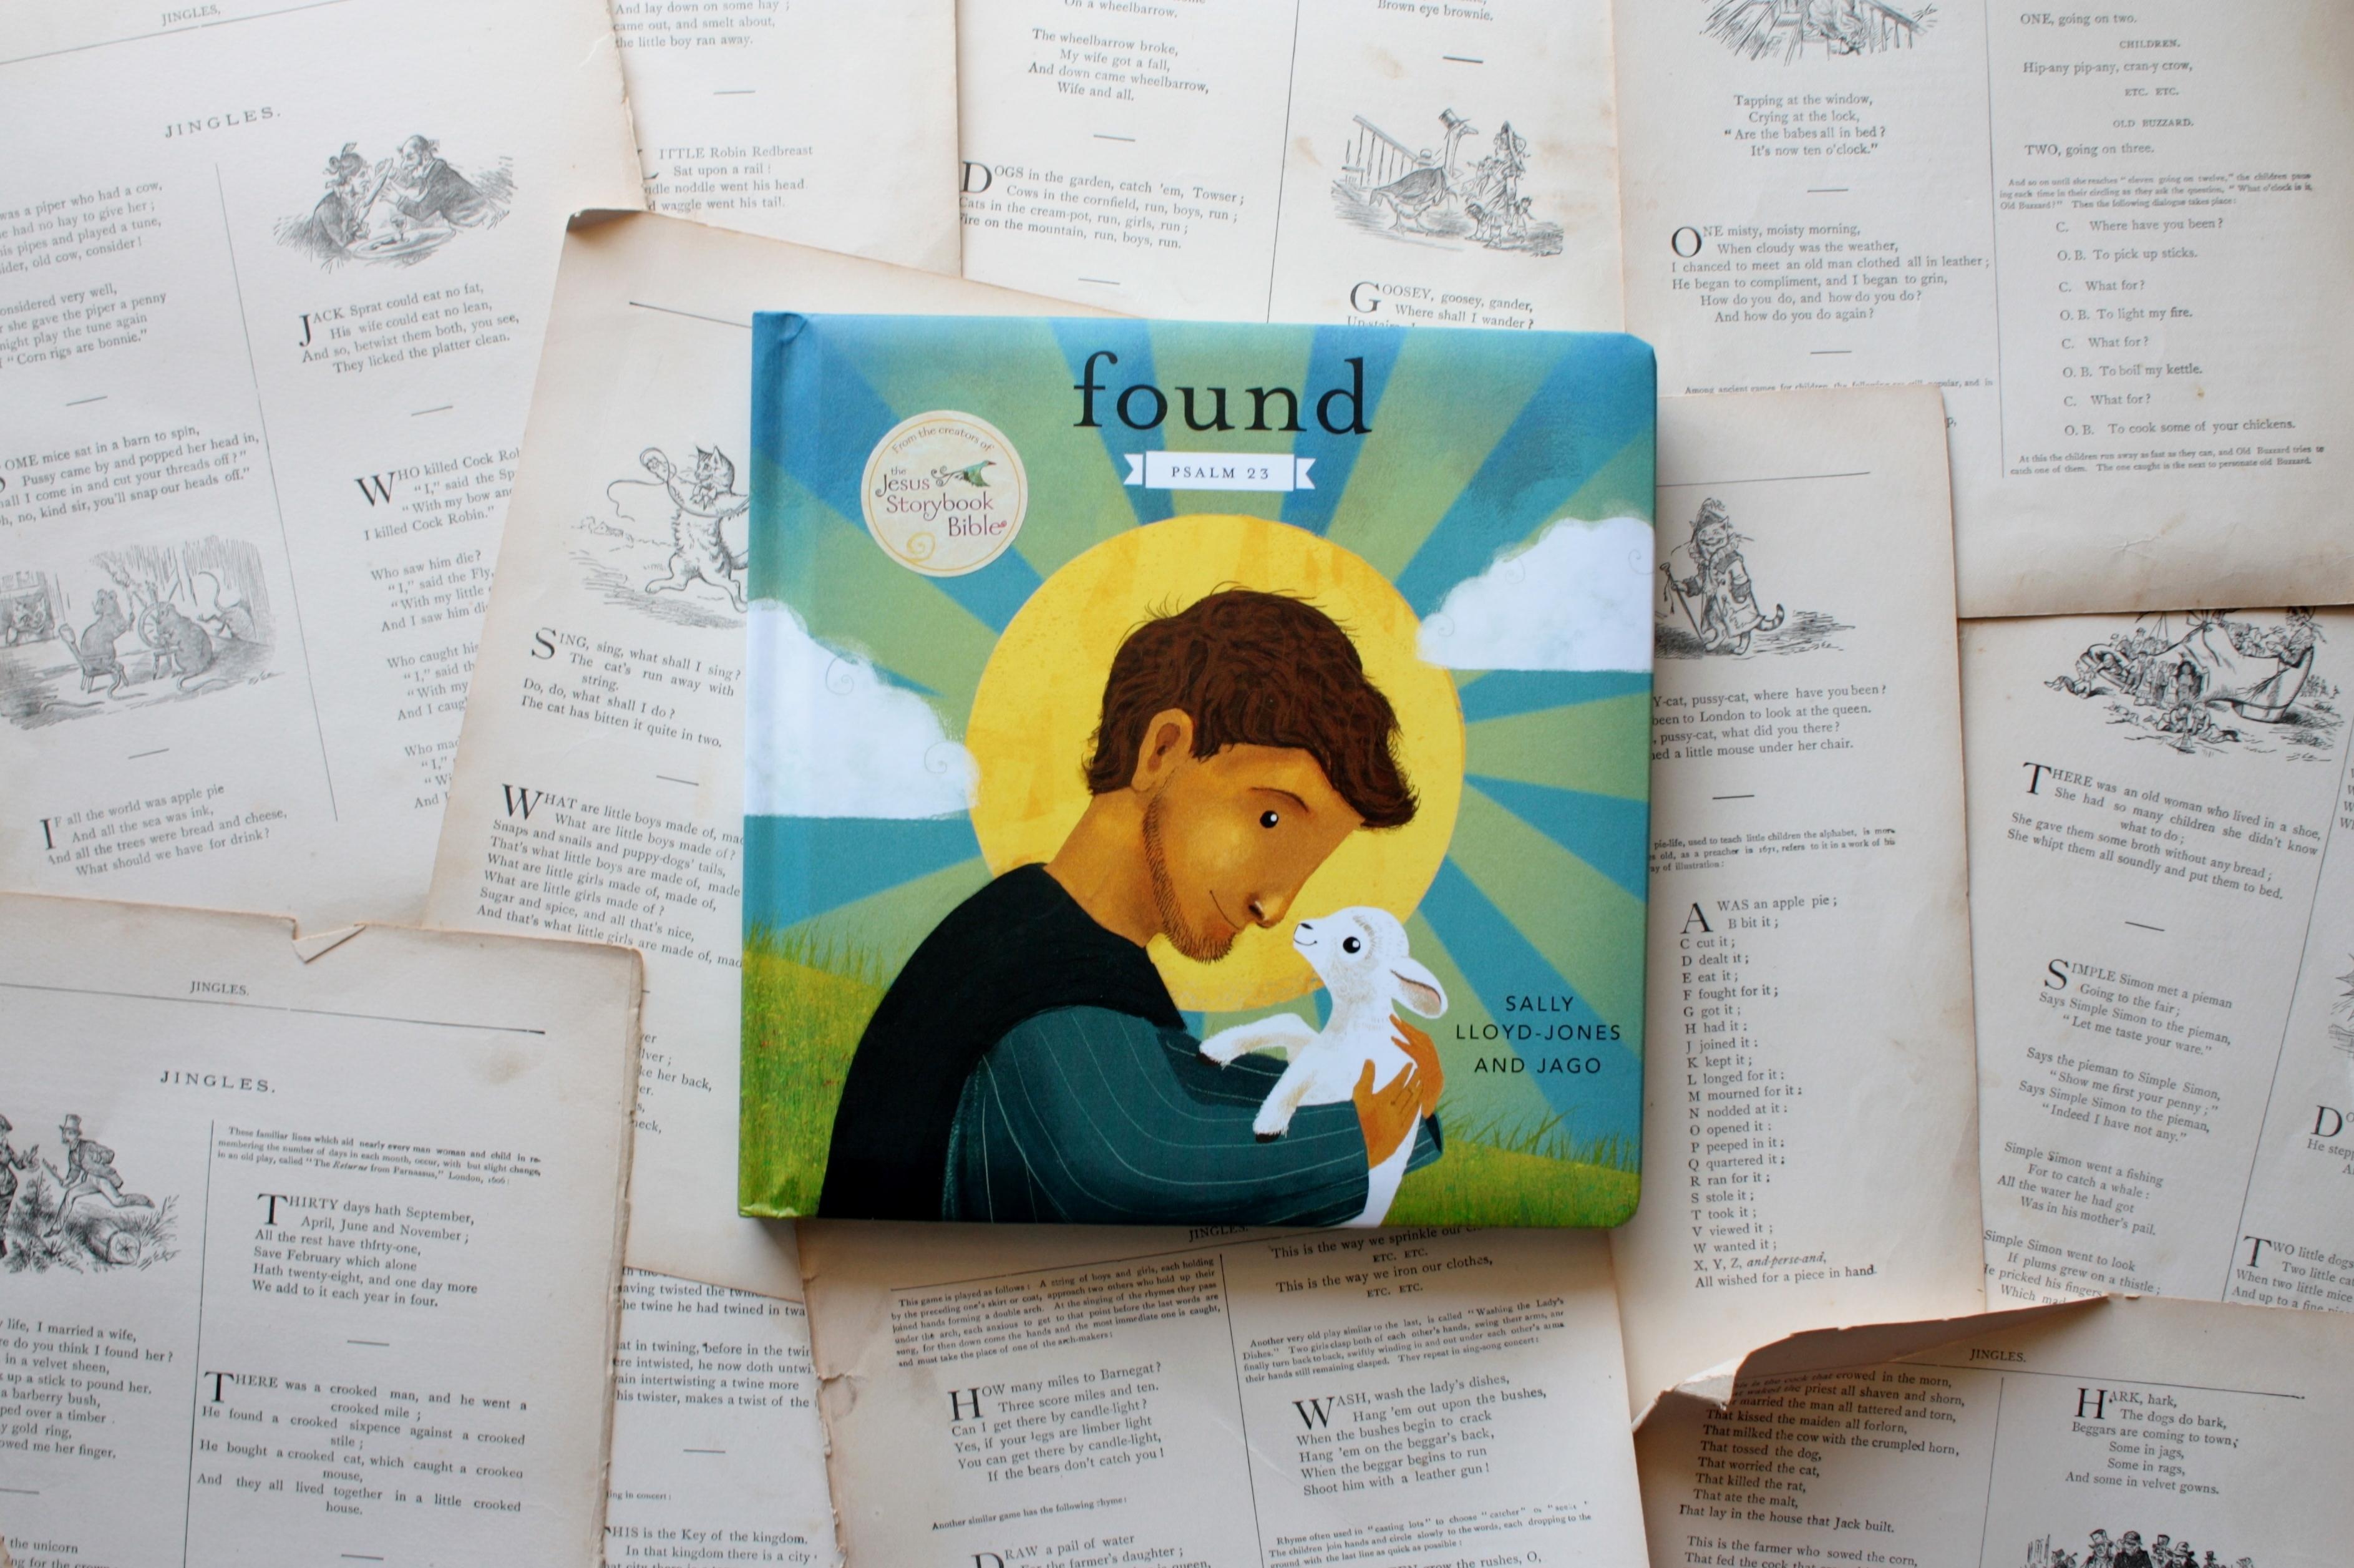 Found | Sally Lloyd-Jones